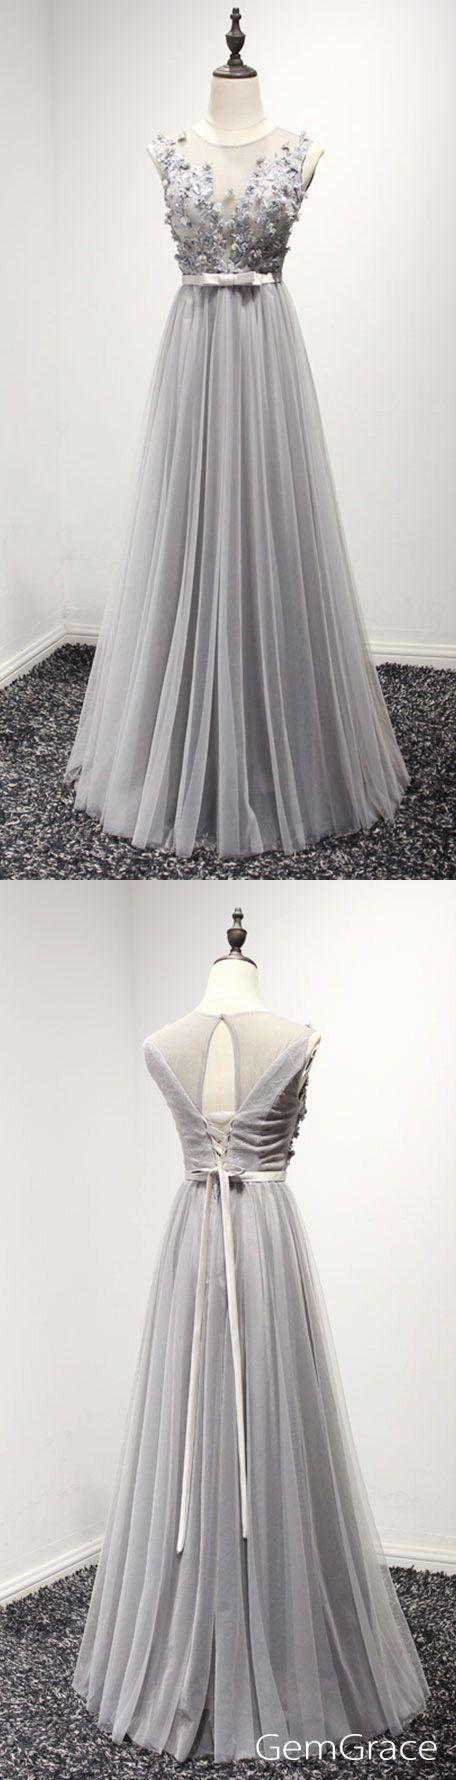 Classy long tulle prom dress in grey